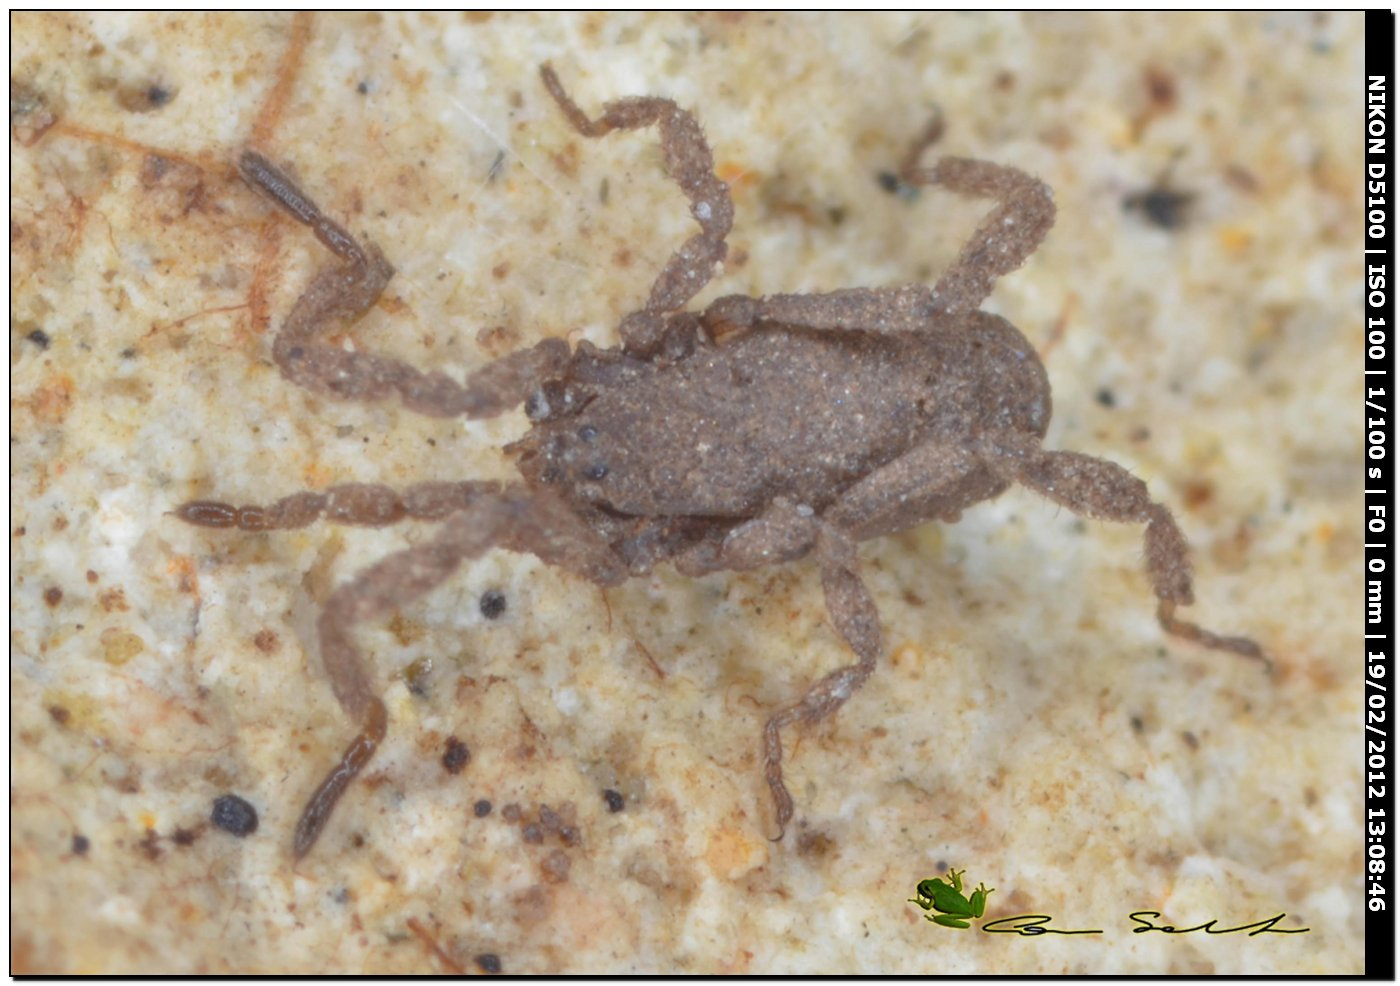 Anelasmocephalus brignolii da Ittiri (Sardegna)